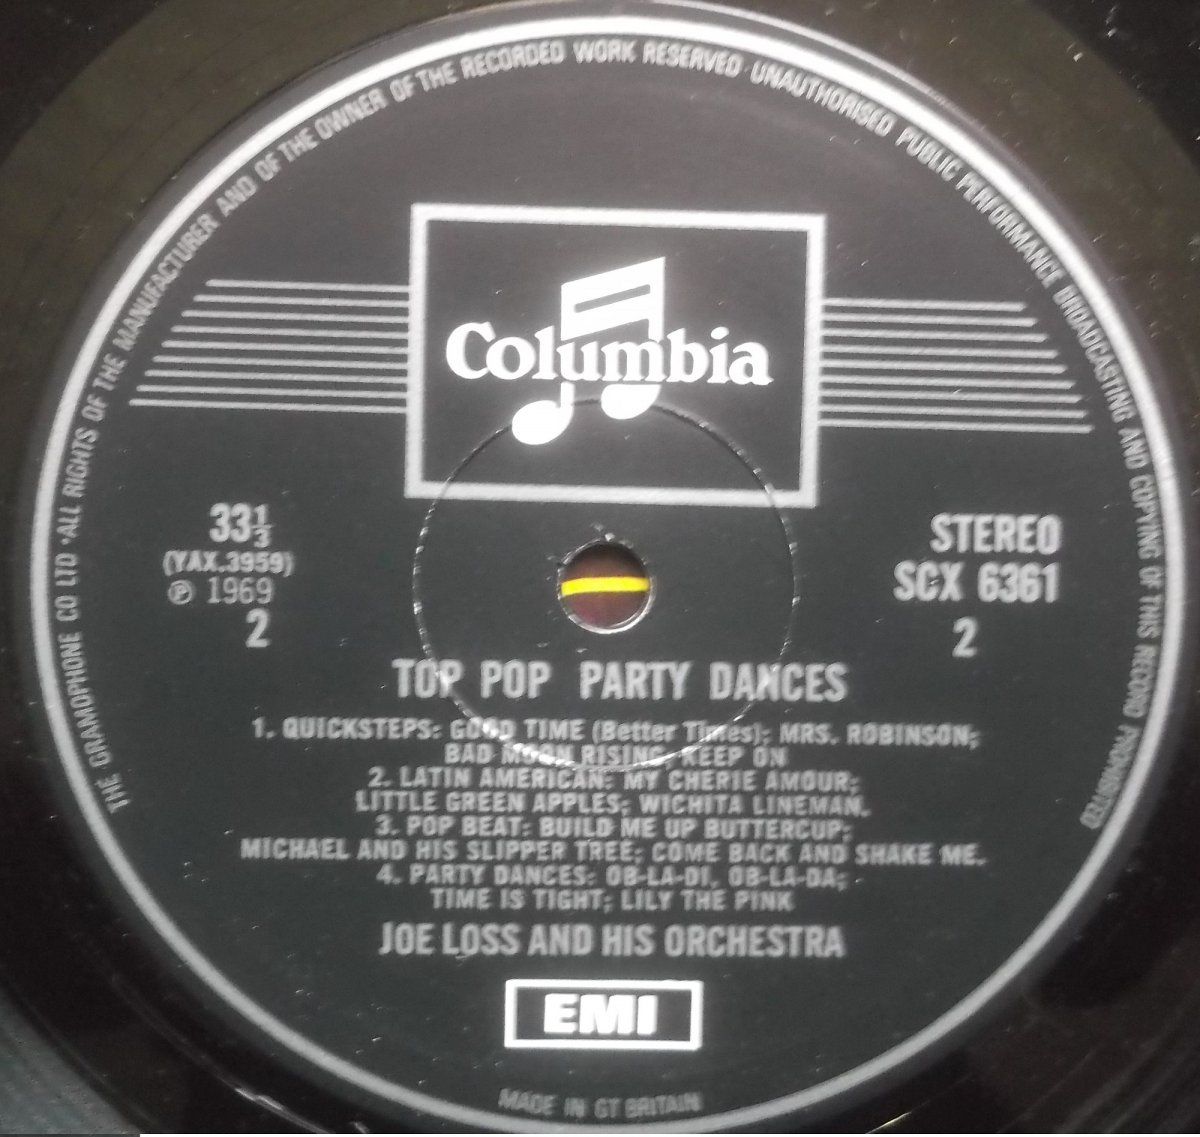 Joe Loss And His Orchestra – Top Pop Party Dances